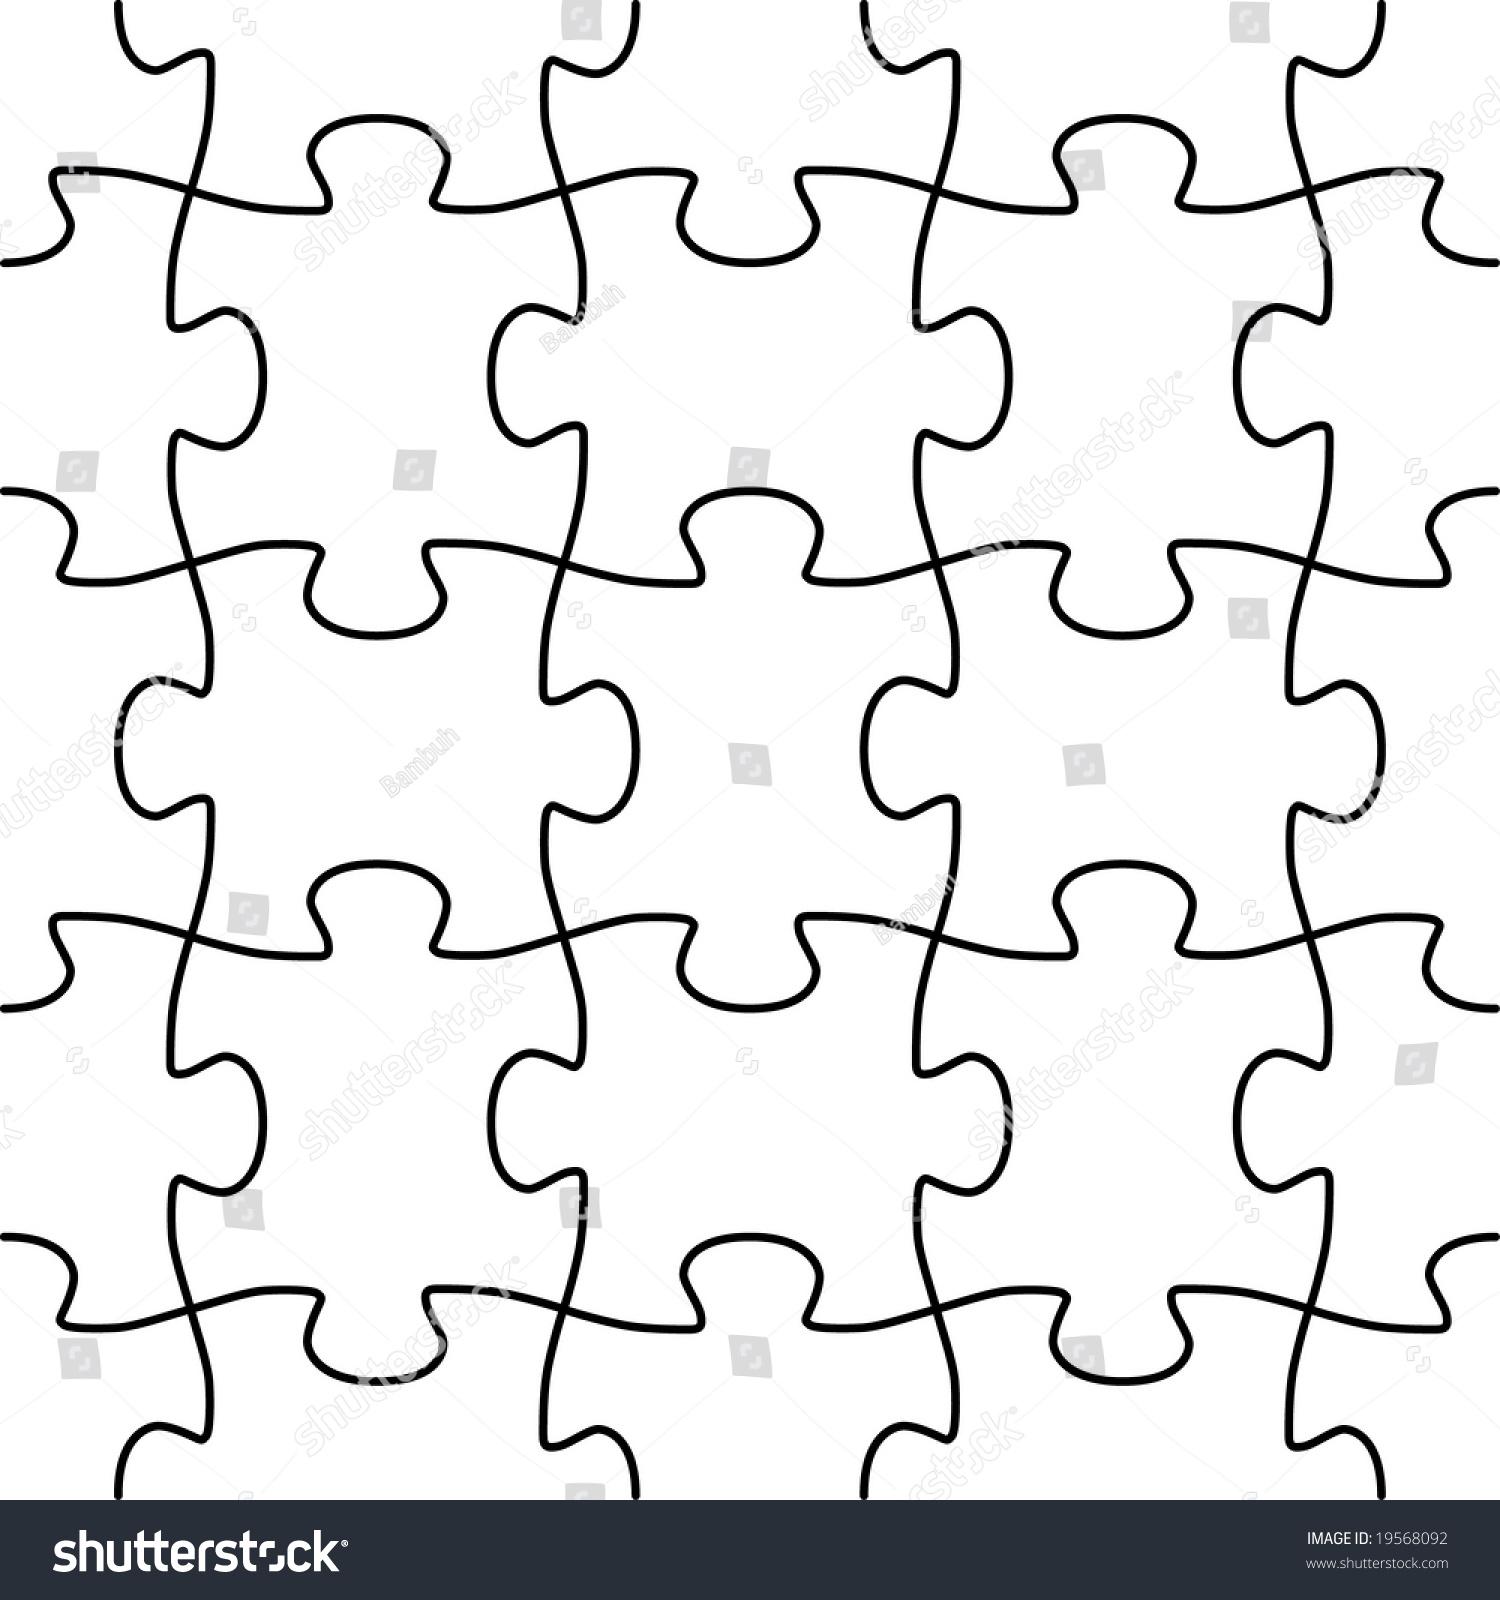 Seamless Puzzle Vector Shape Stock Vector 19568092 - Shutterstock